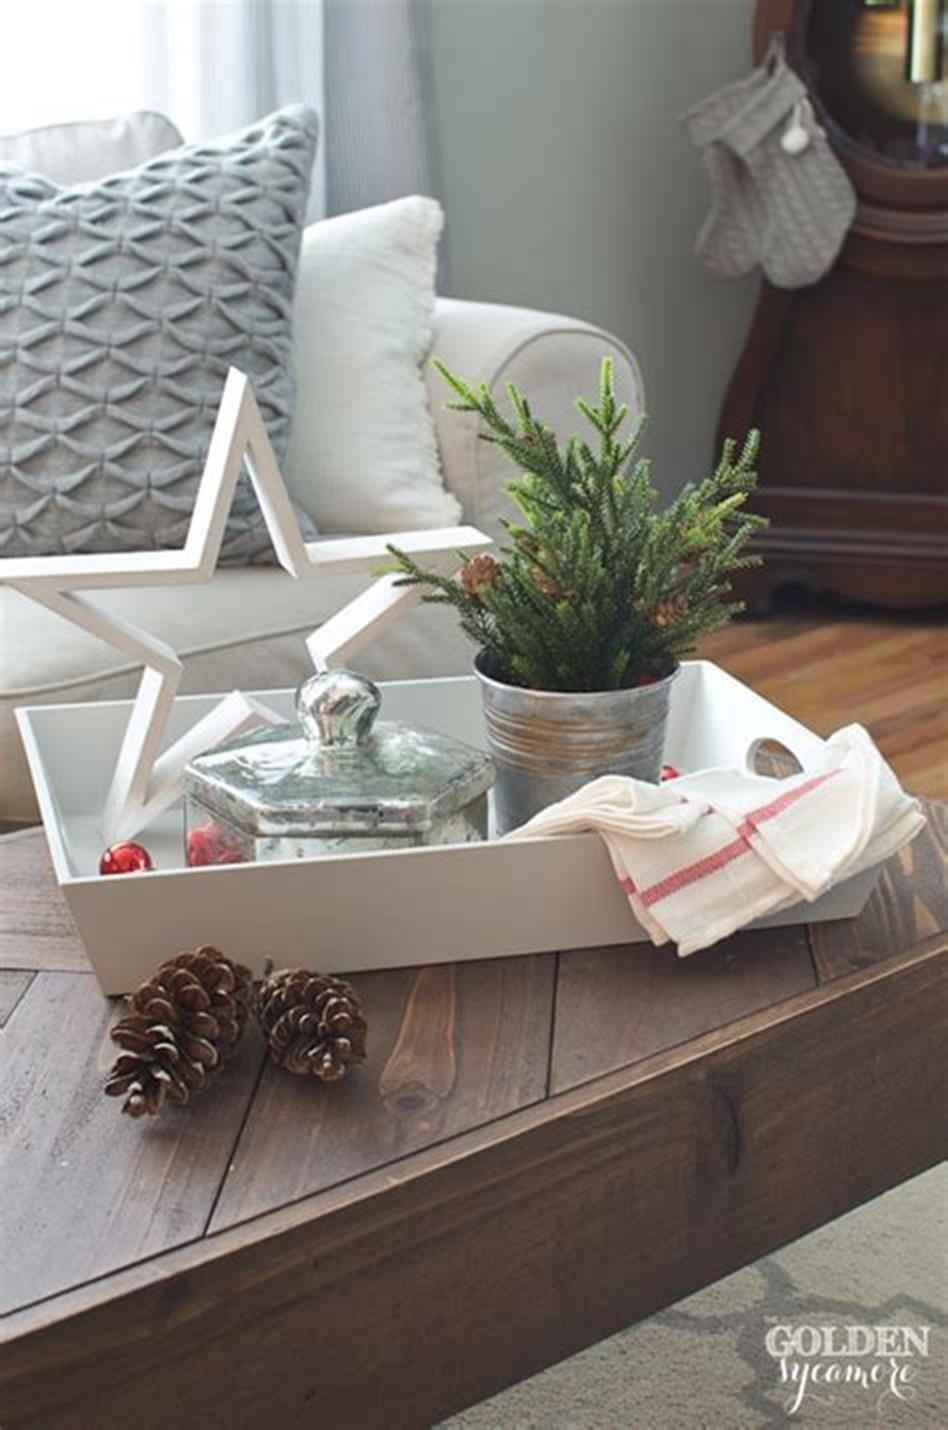 46 Awesome Coffee Table Tray Decor Ideas Farmhouse Coffee Table Decor Coffee Table Decor Tray Coffee Table Farmhouse